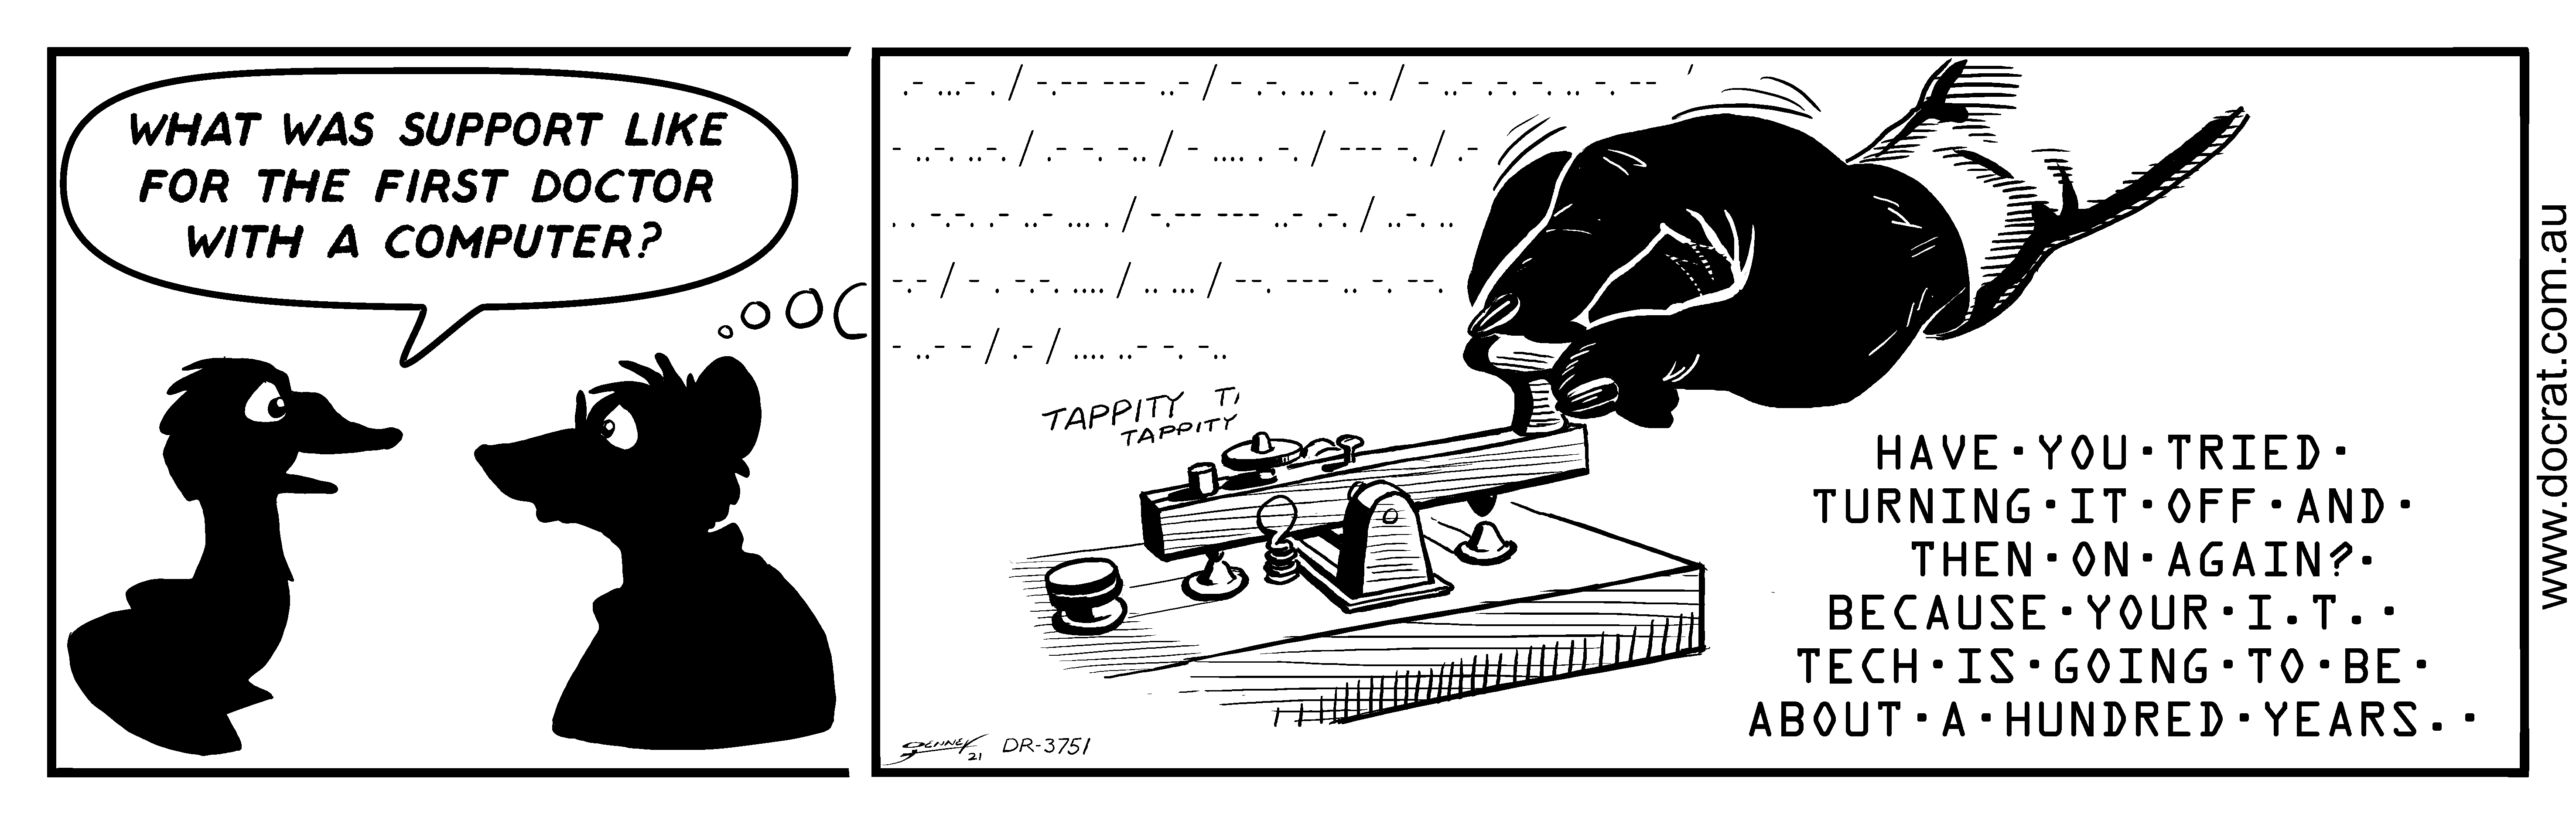 20210531